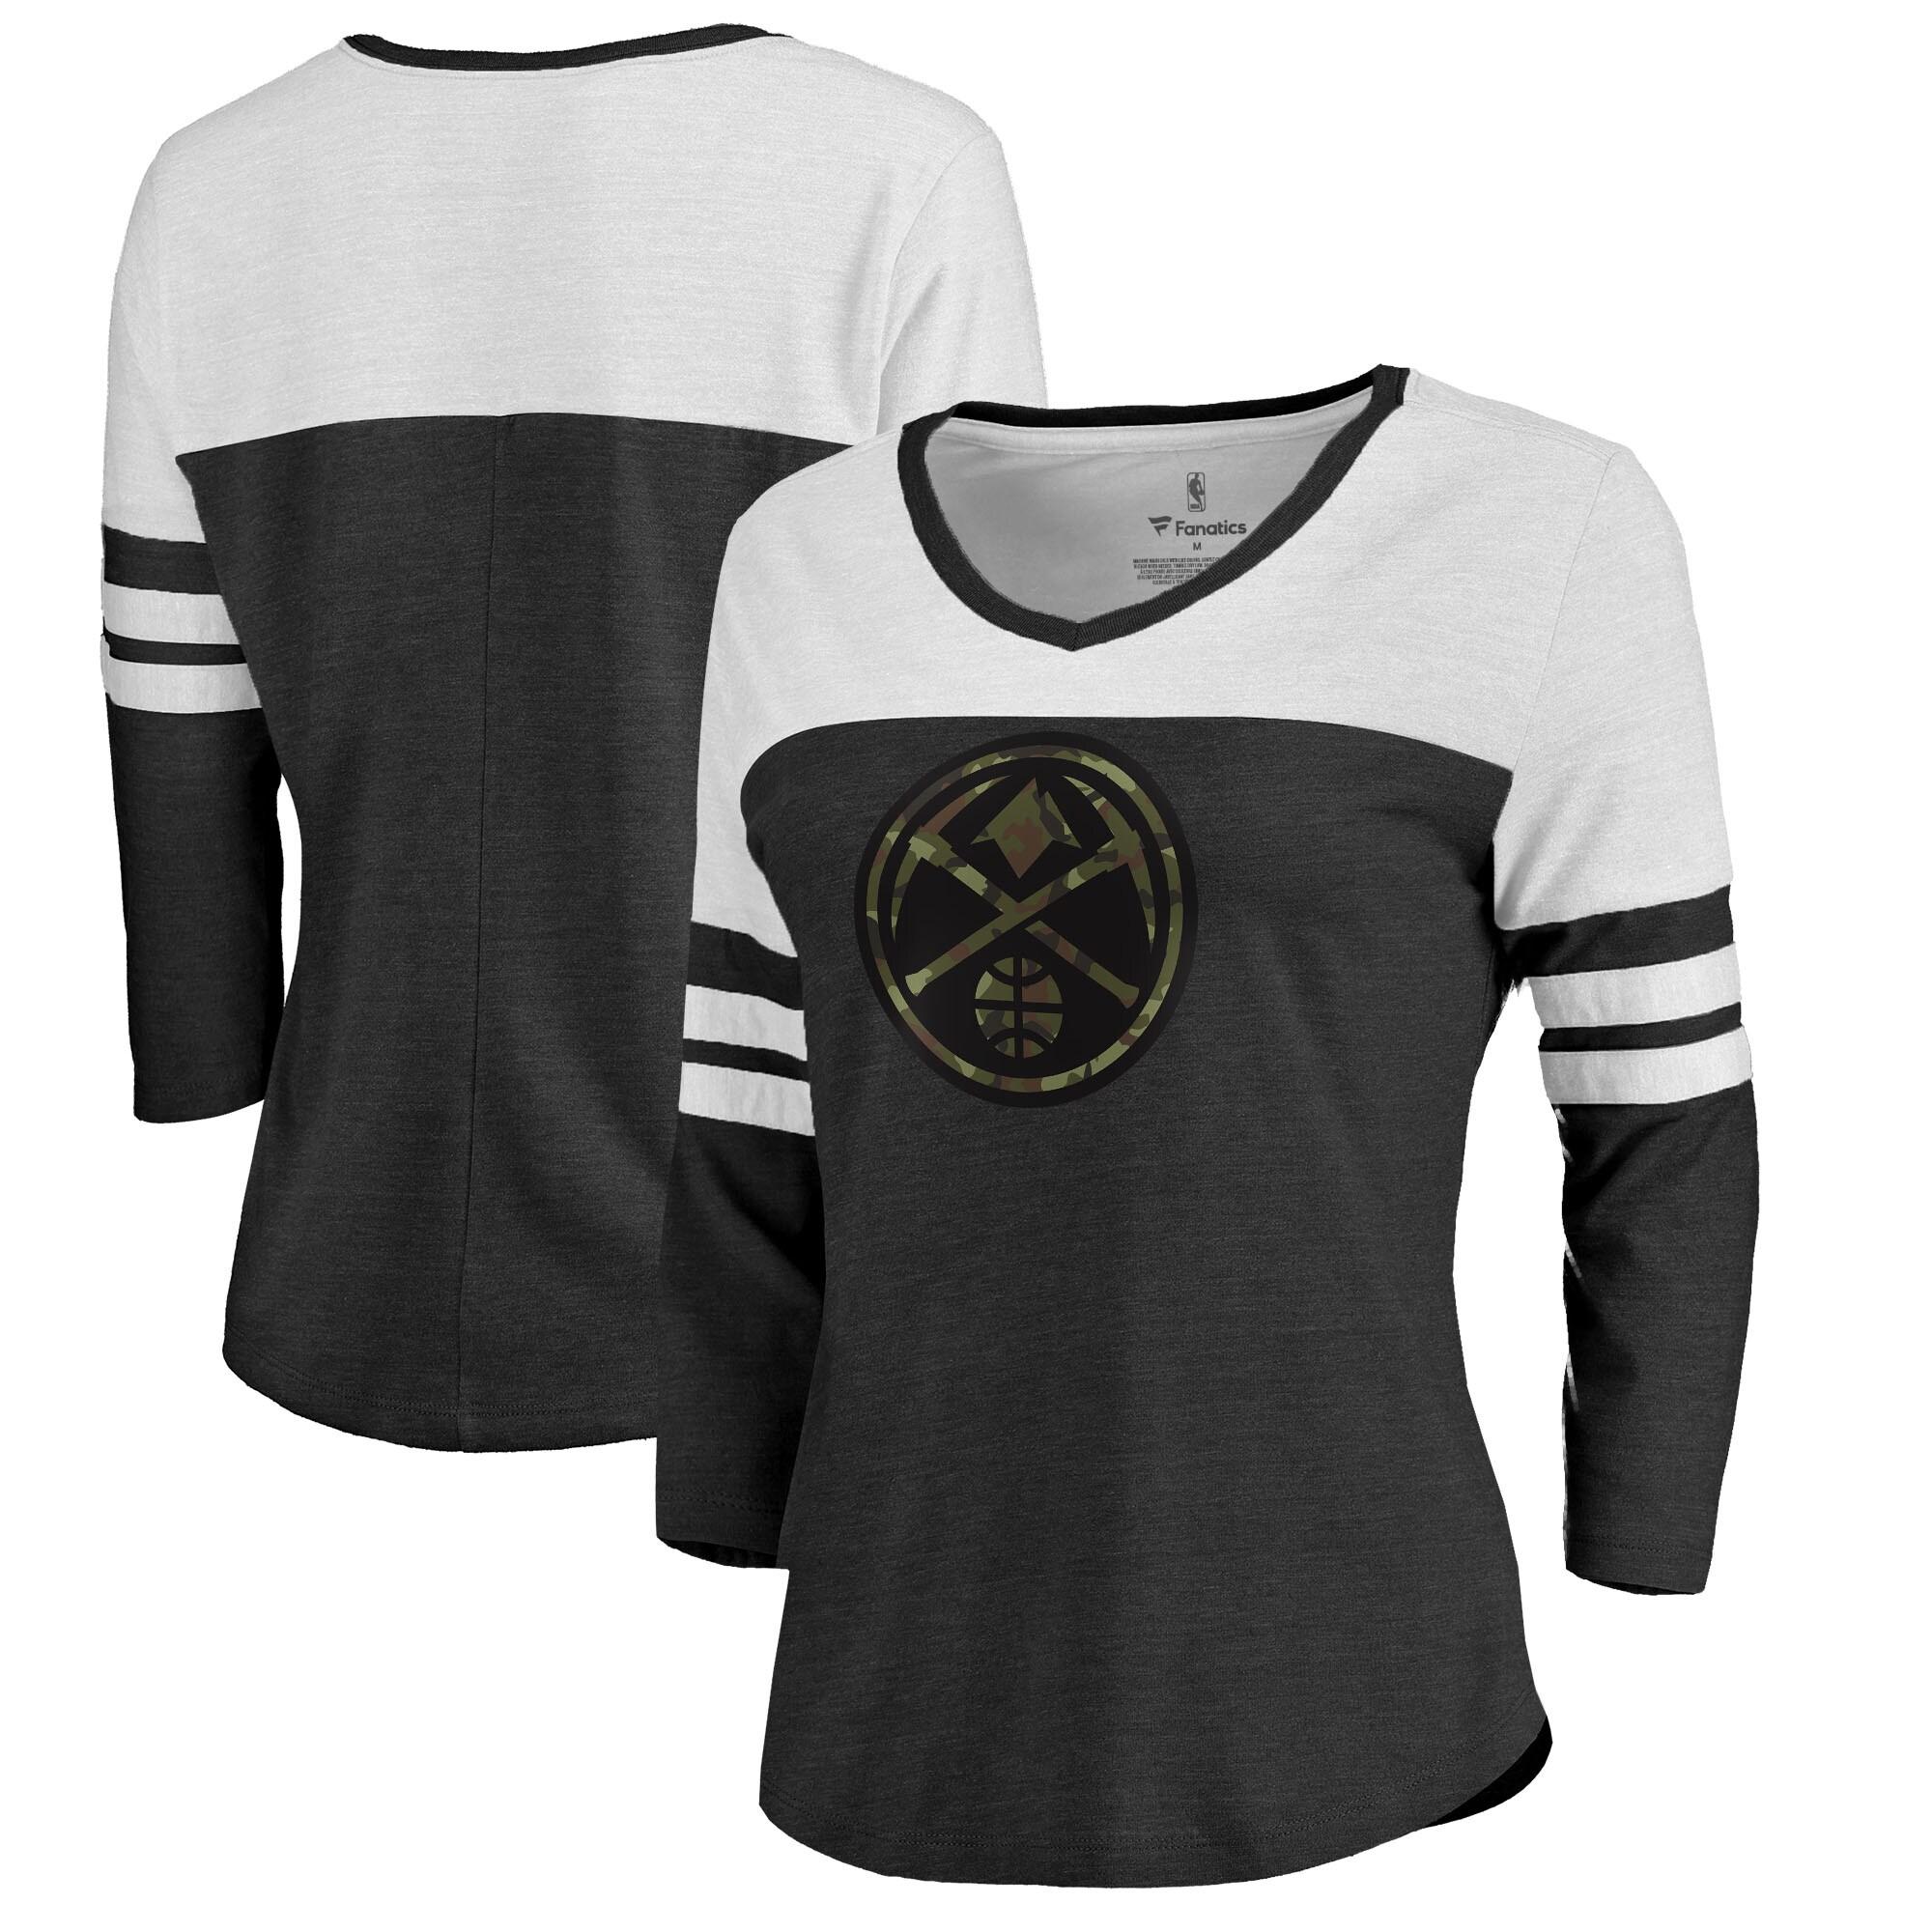 Denver Nuggets Fanatics Branded Women's Prestige Camo Raglan 3/4-Sleeve V-Neck T-Shirt - Black